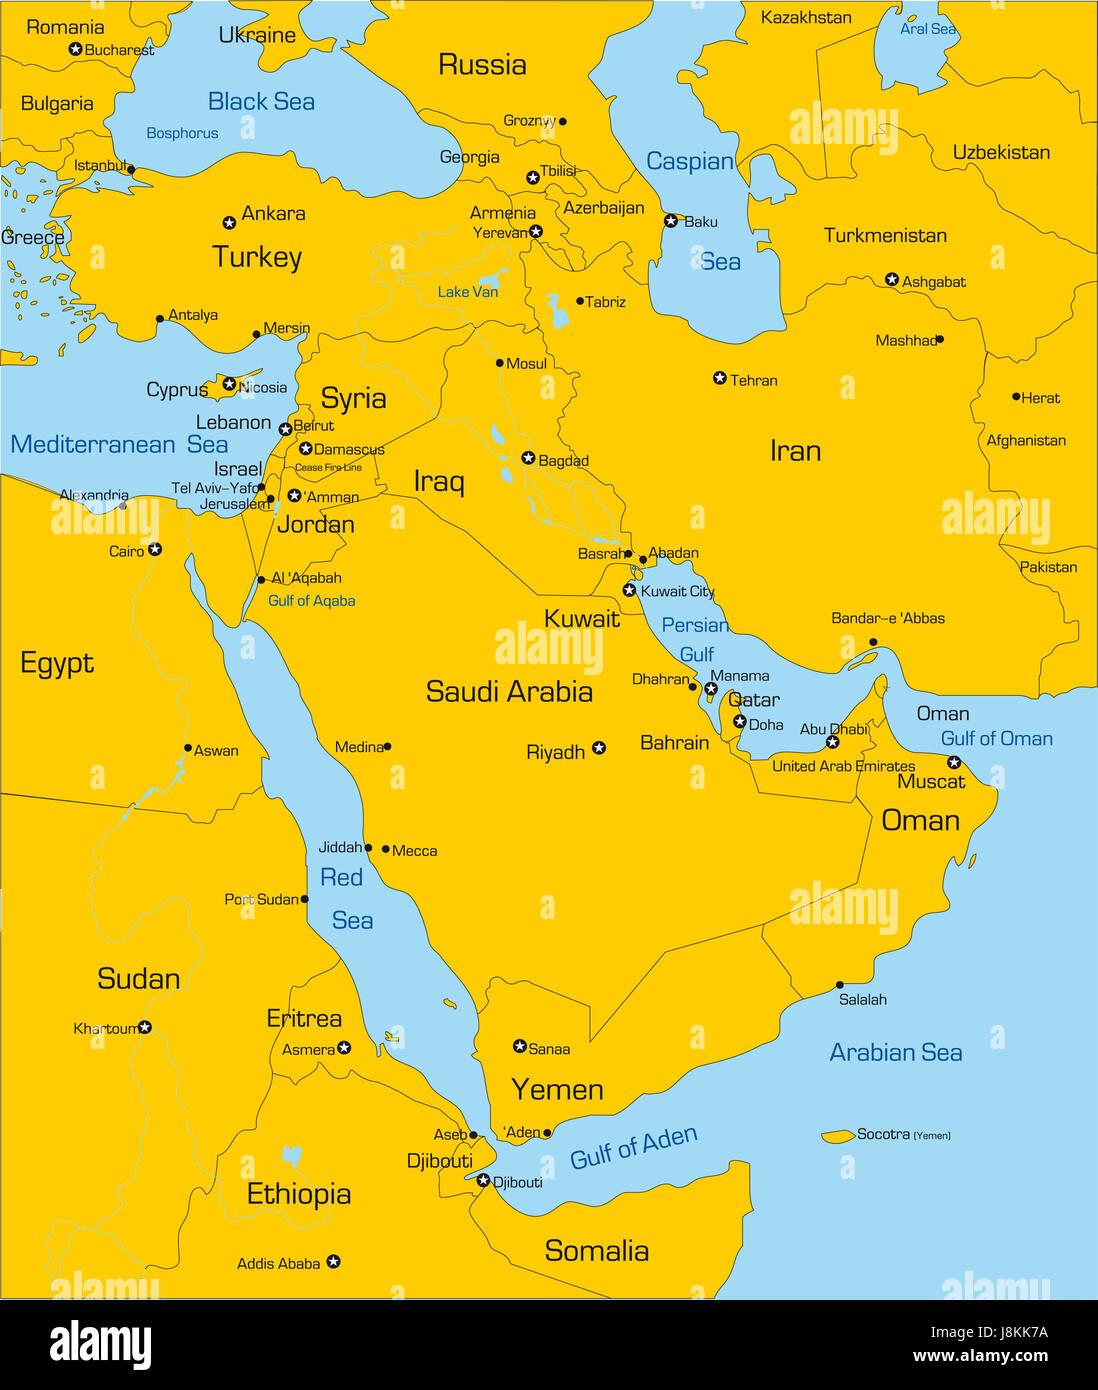 Map Of Asia Jordan.Travel Political Chart Asia Europe Jordan Flag Turkey Arab